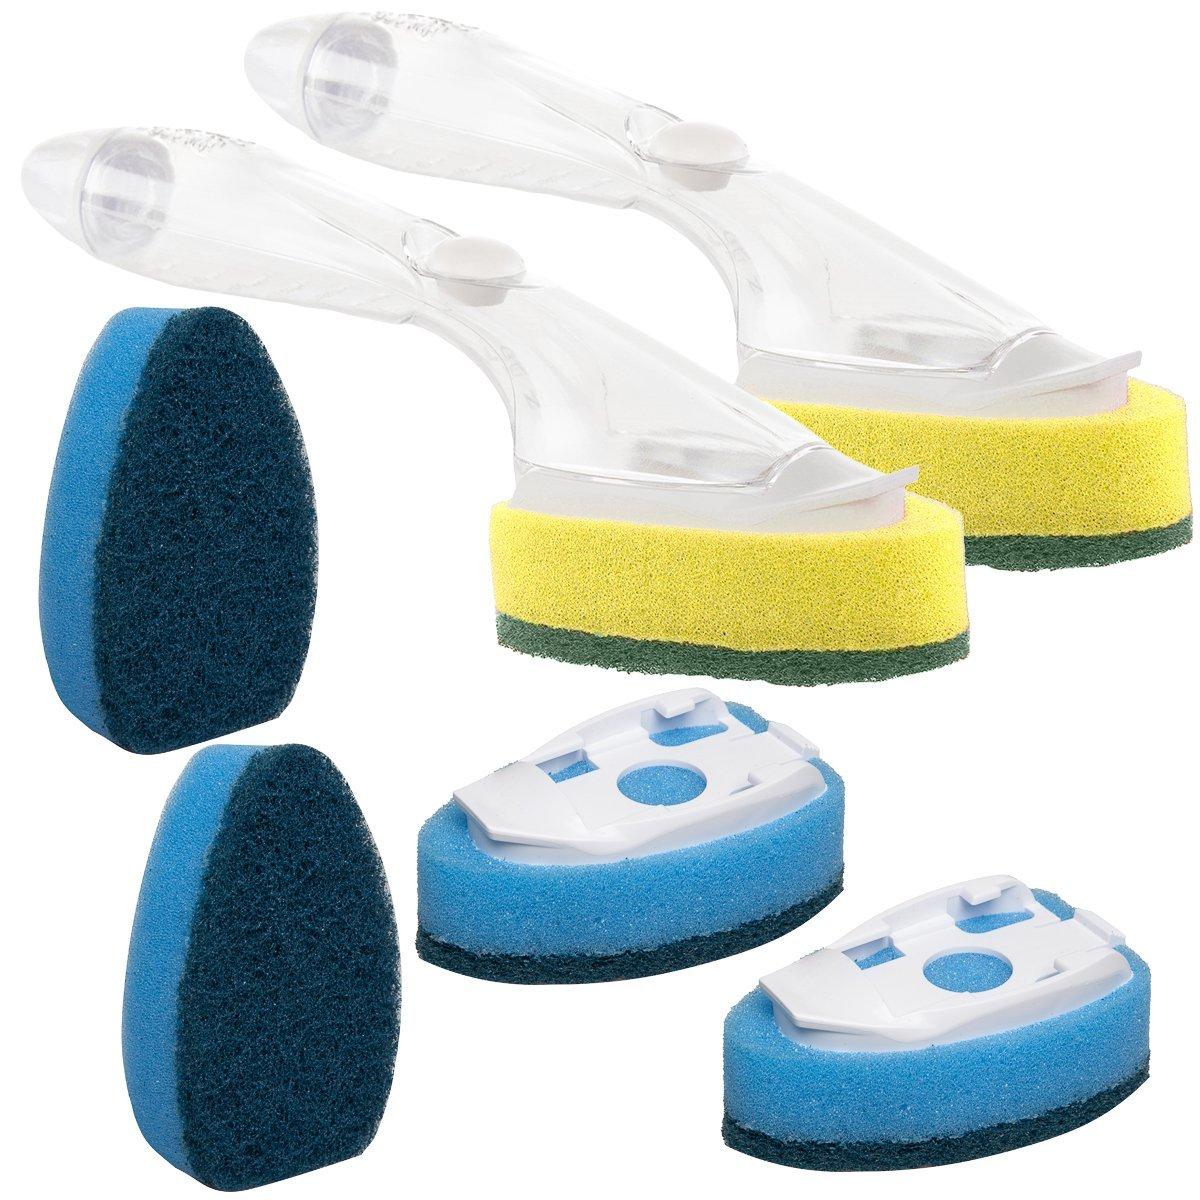 Seifenspender Spülbürste Kunststoffbürste Spülbecken Reinigungsbürste